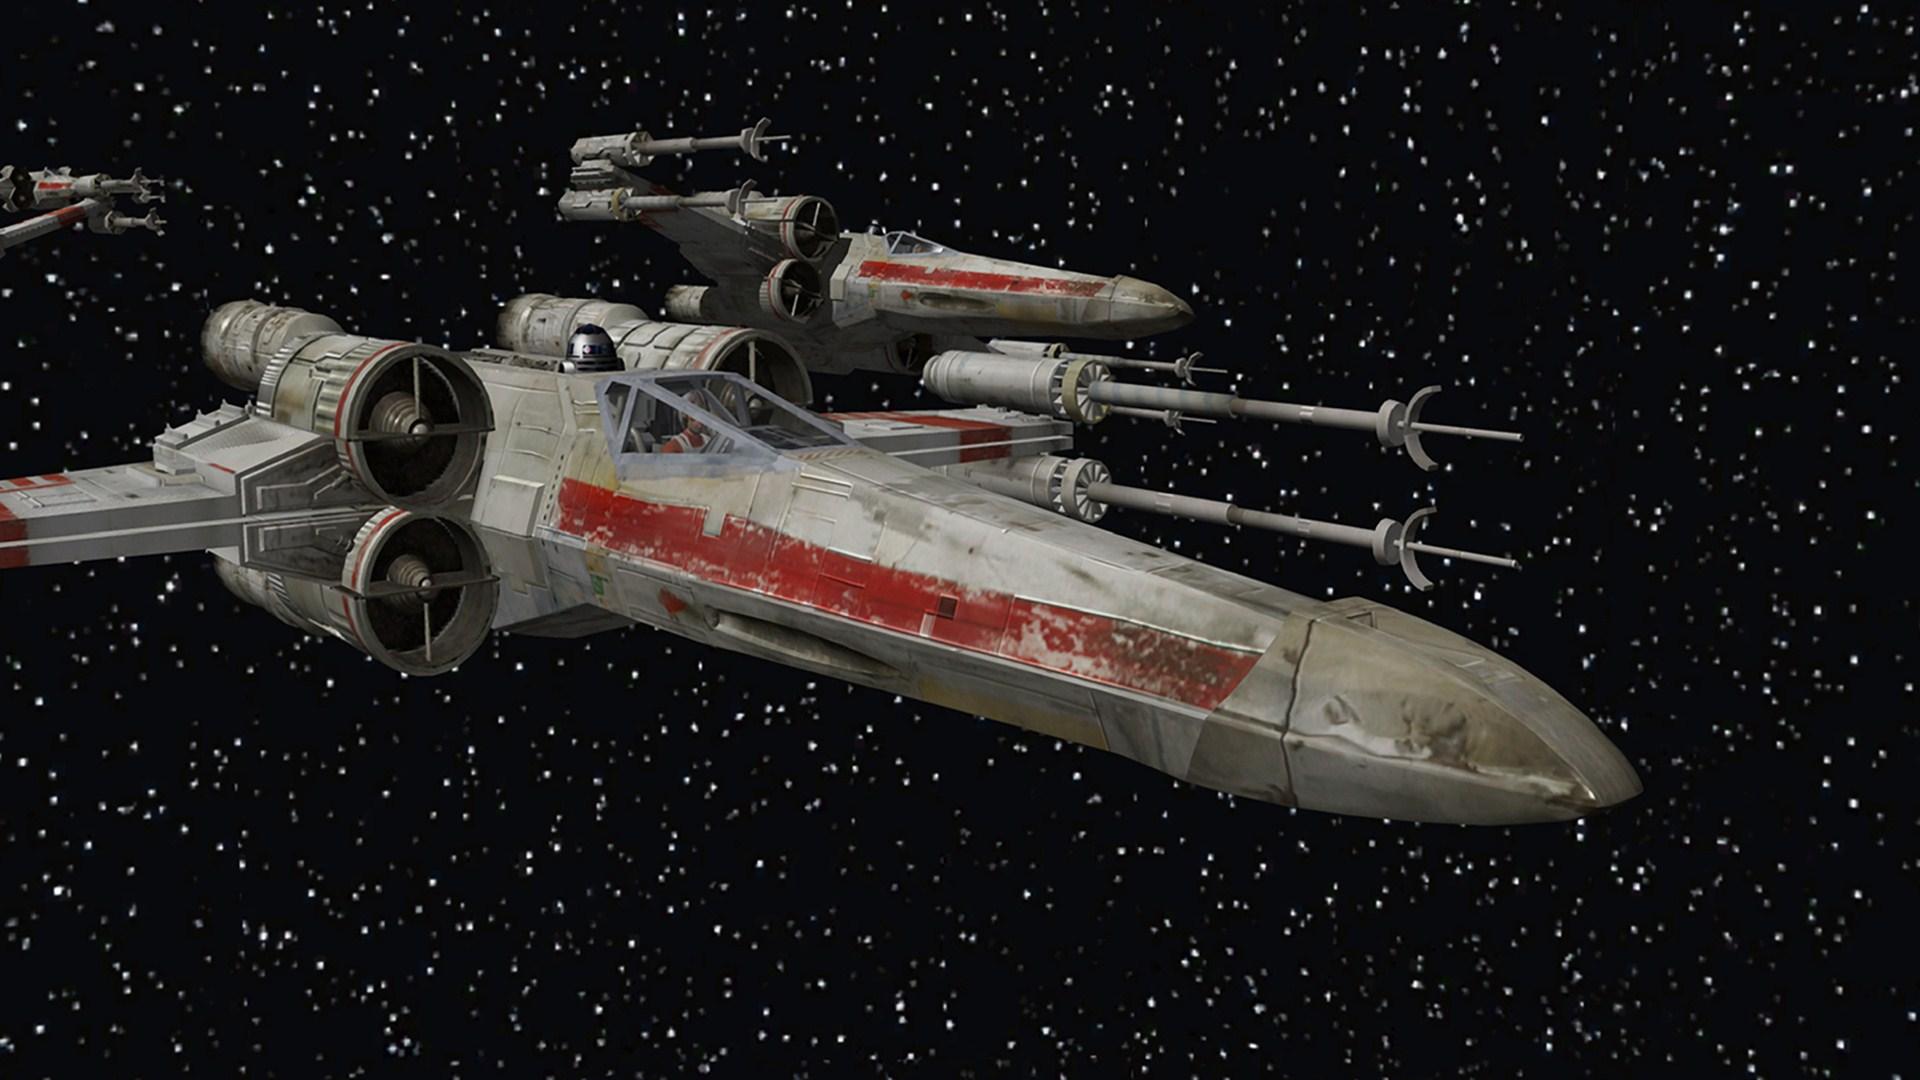 Simple Wallpaper High Resolution Star Wars - High-Resolution-Star-Wars-Wallpapers-038  Trends_939734.jpg